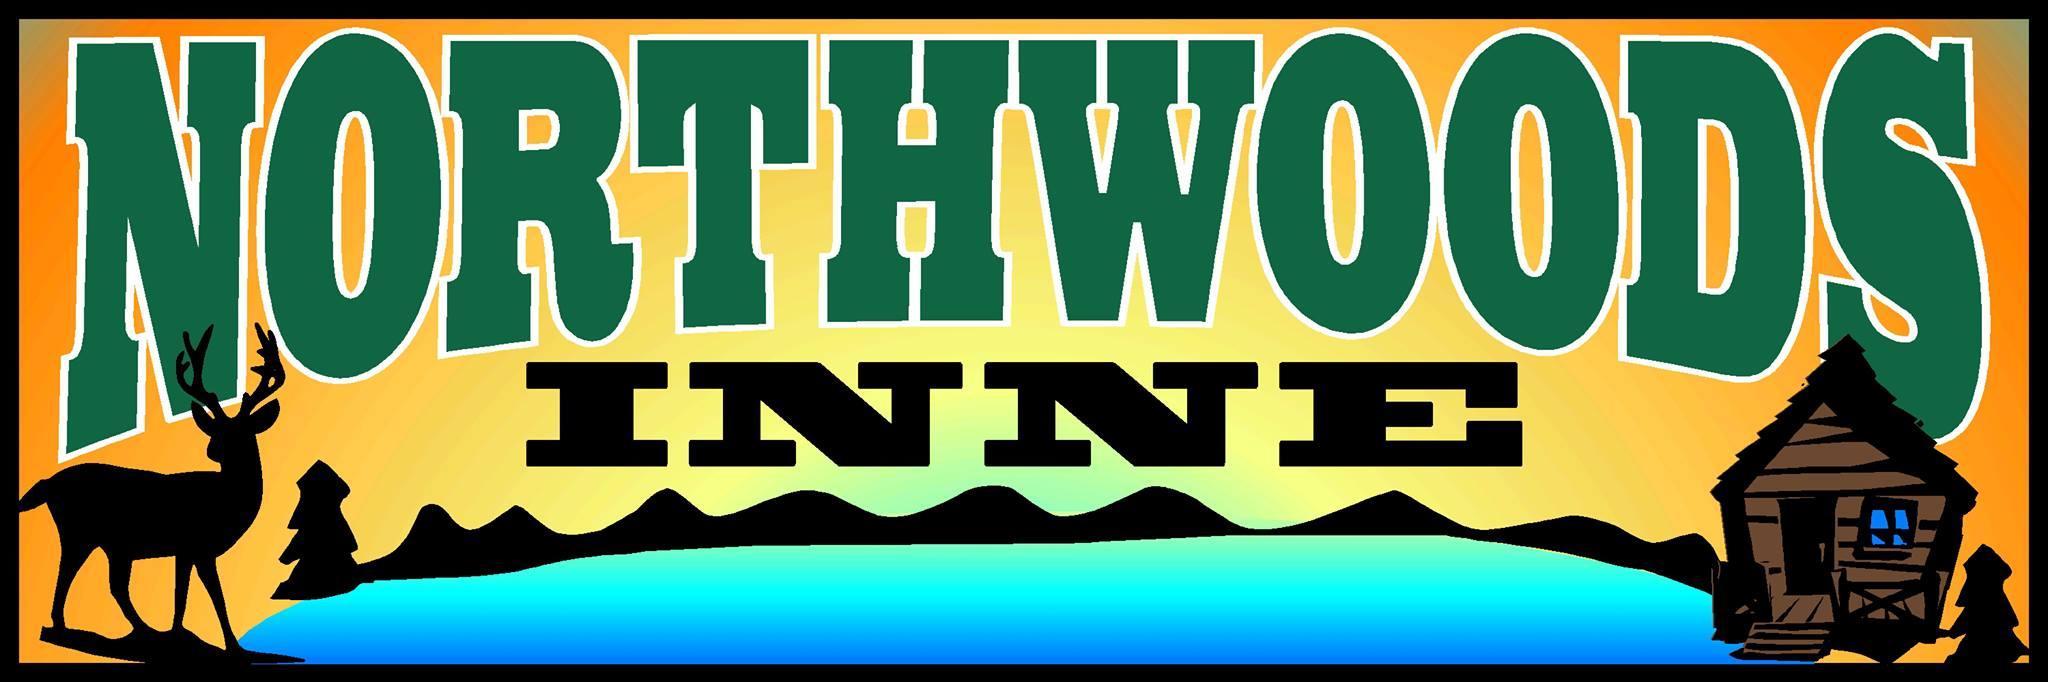 Northwoods Inne